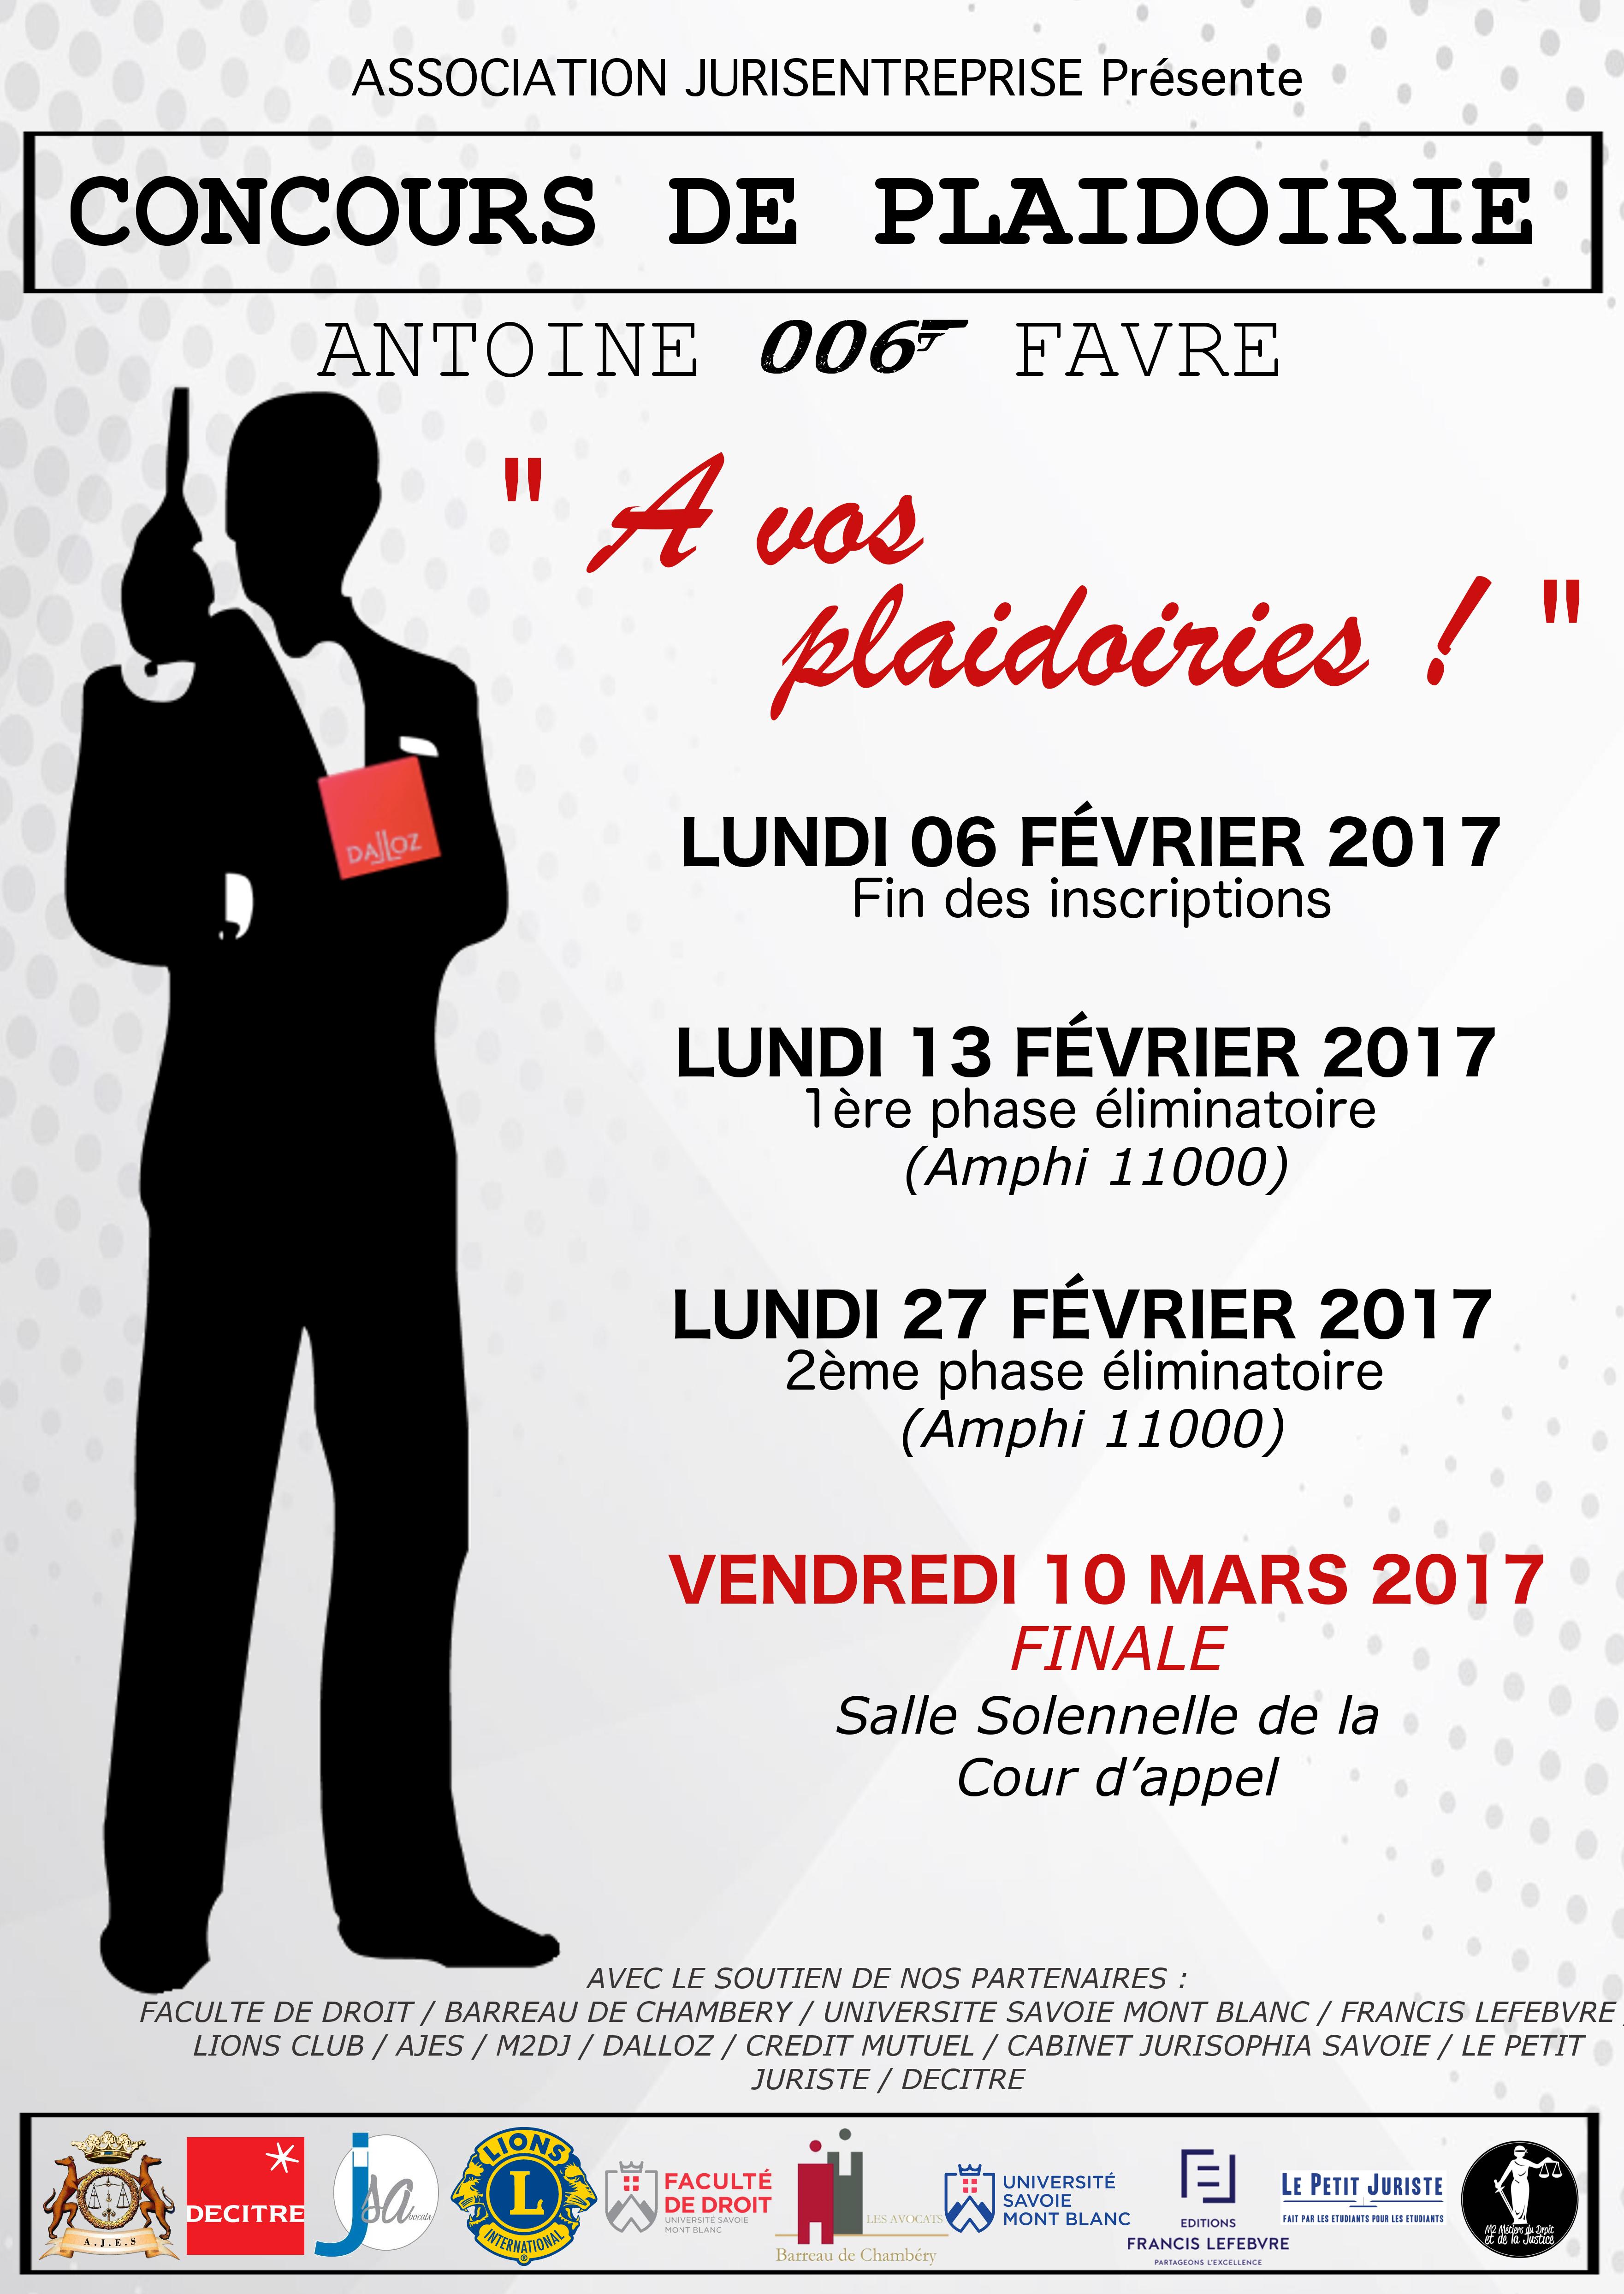 Concours plaidoirie 6e édition